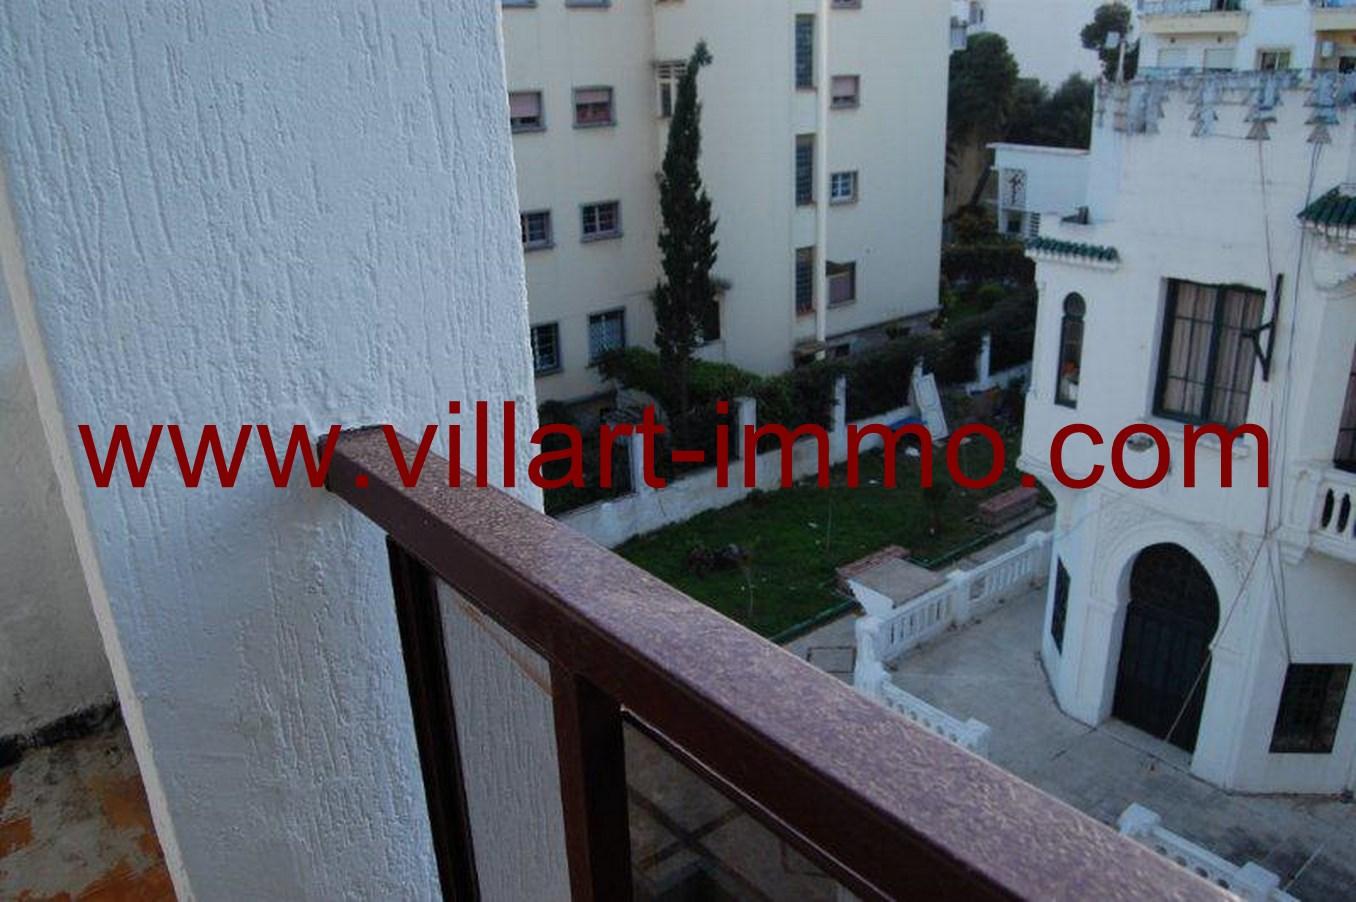 8-Location-Appartement-non meublé-Tanger-balcon-L615-Villart-immo